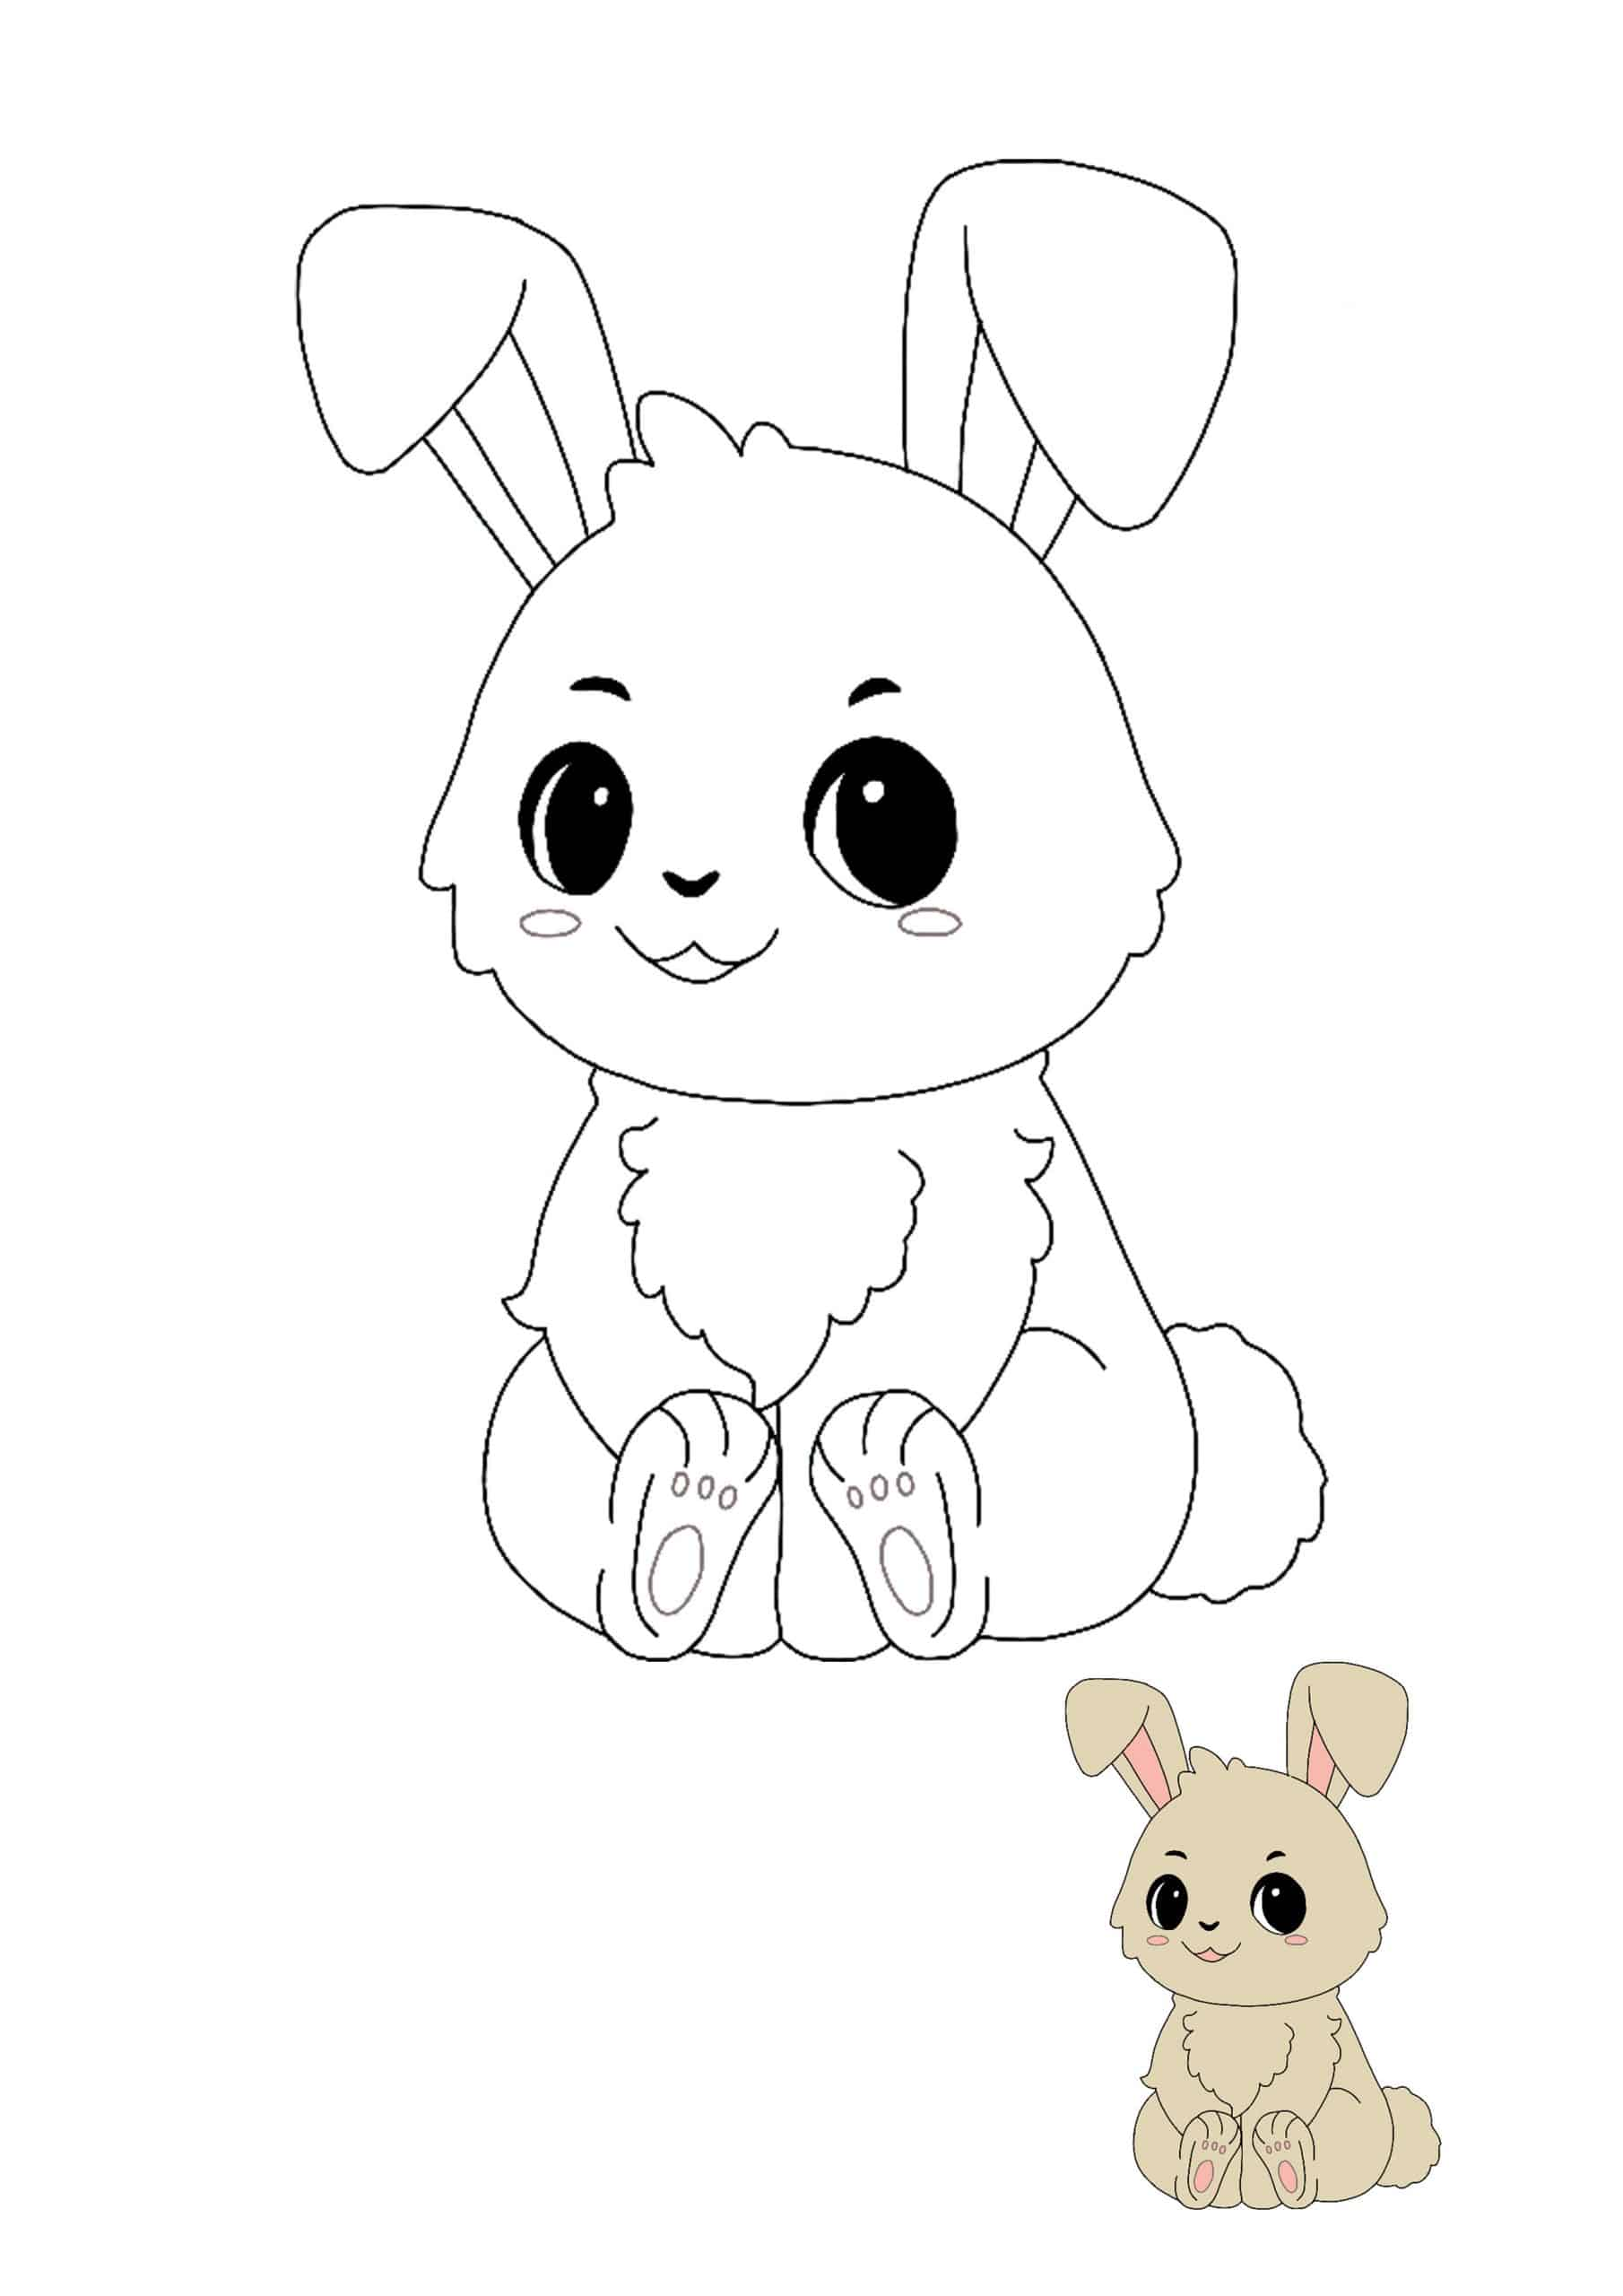 Chibi Kawaii Bunny coloring sheet